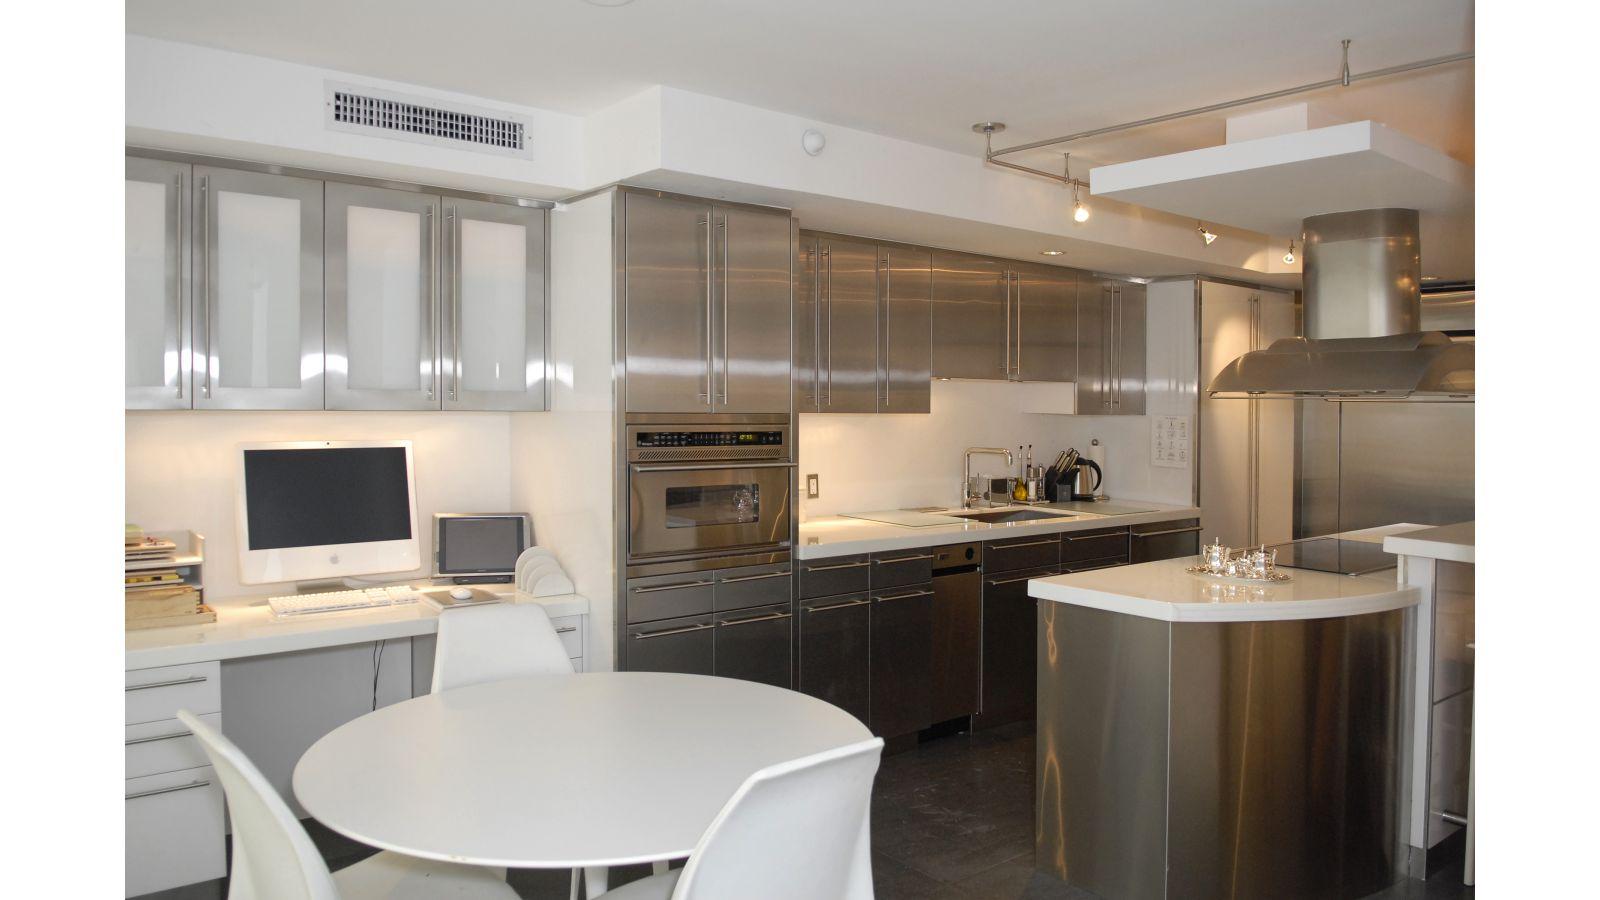 Indoor Stainless Steel Kitchens